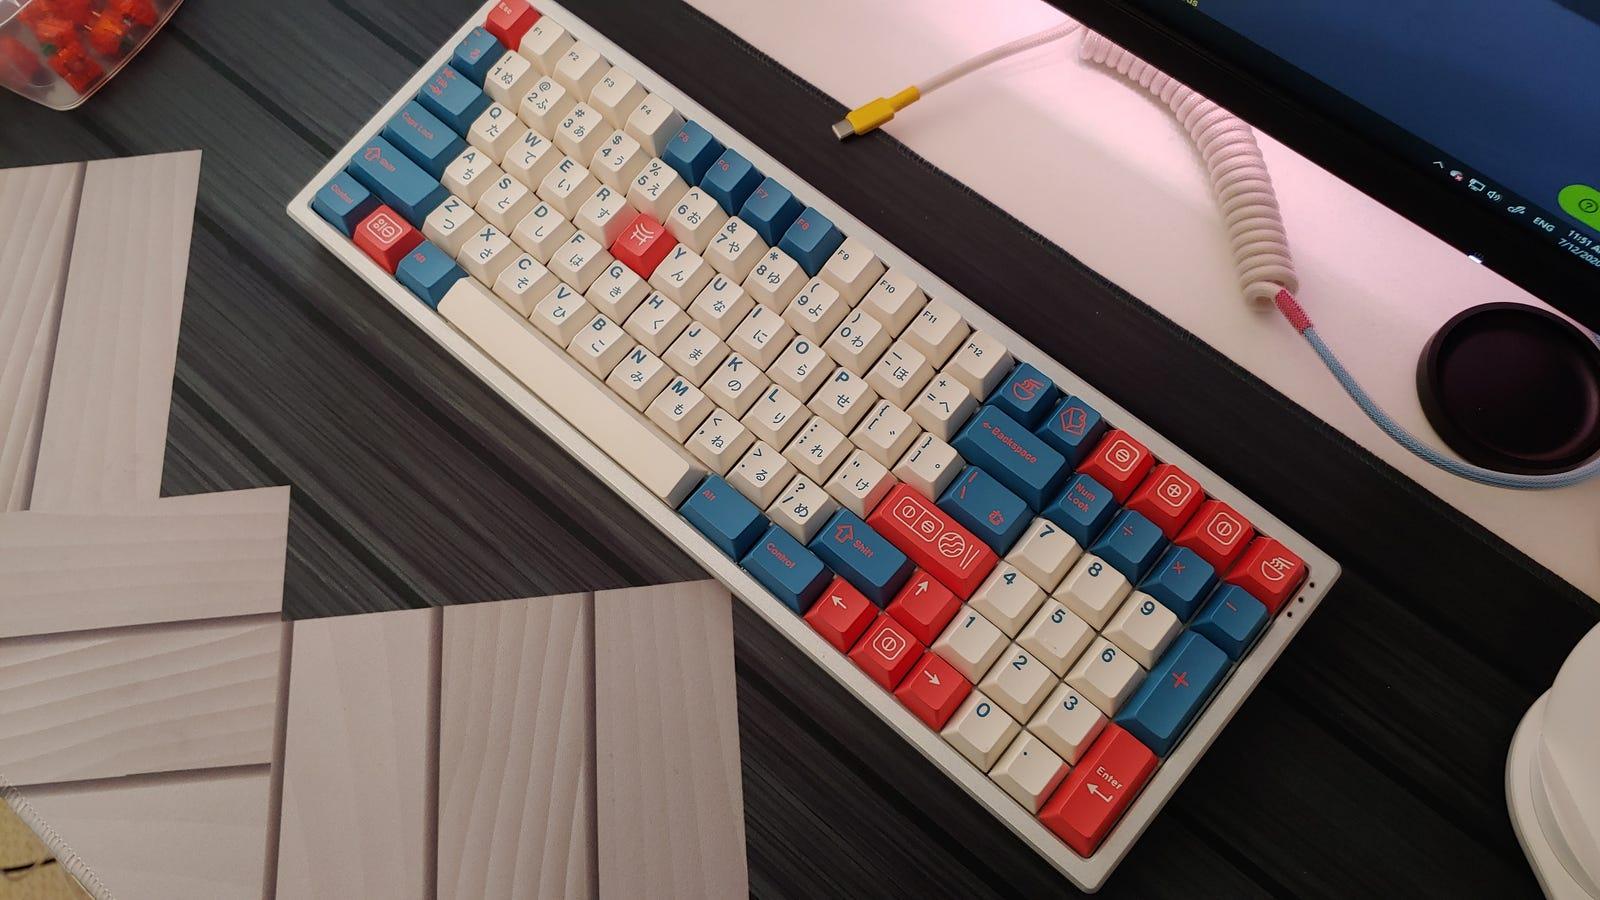 96% mechanical keyboard on top of black deskmat